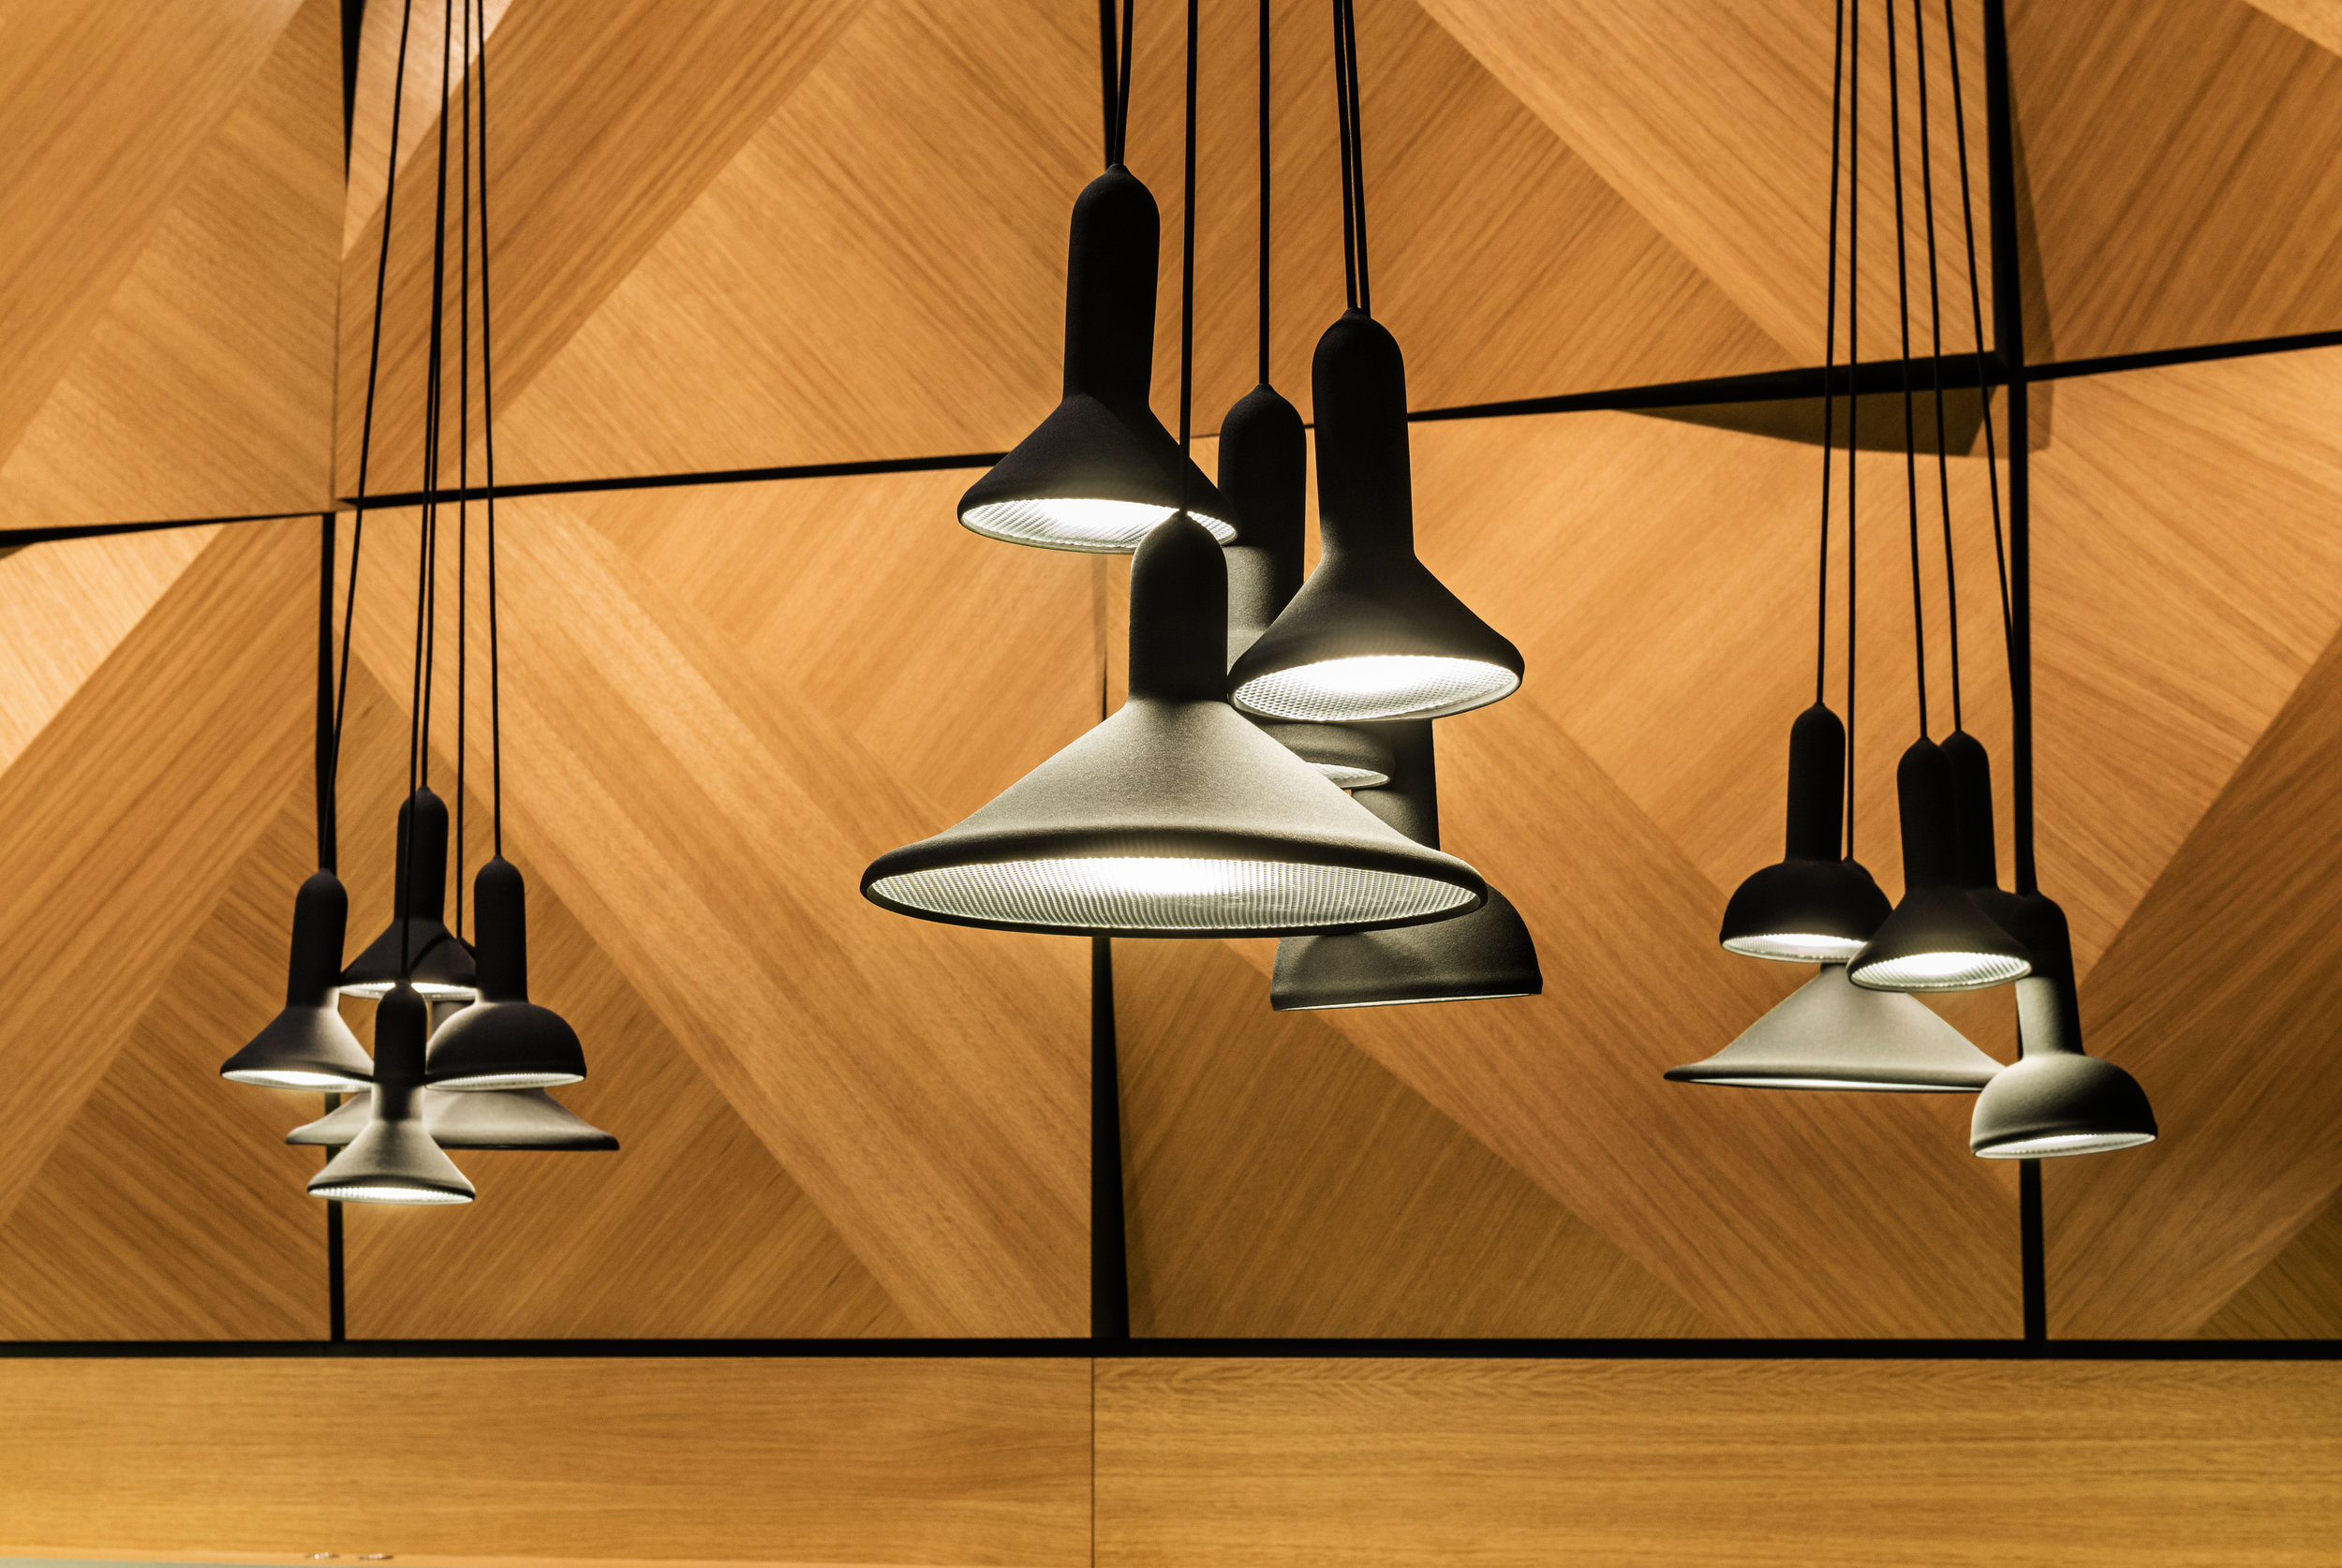 microsoft-center_coorporate-interior-design_coordination-berlin_05.jpg